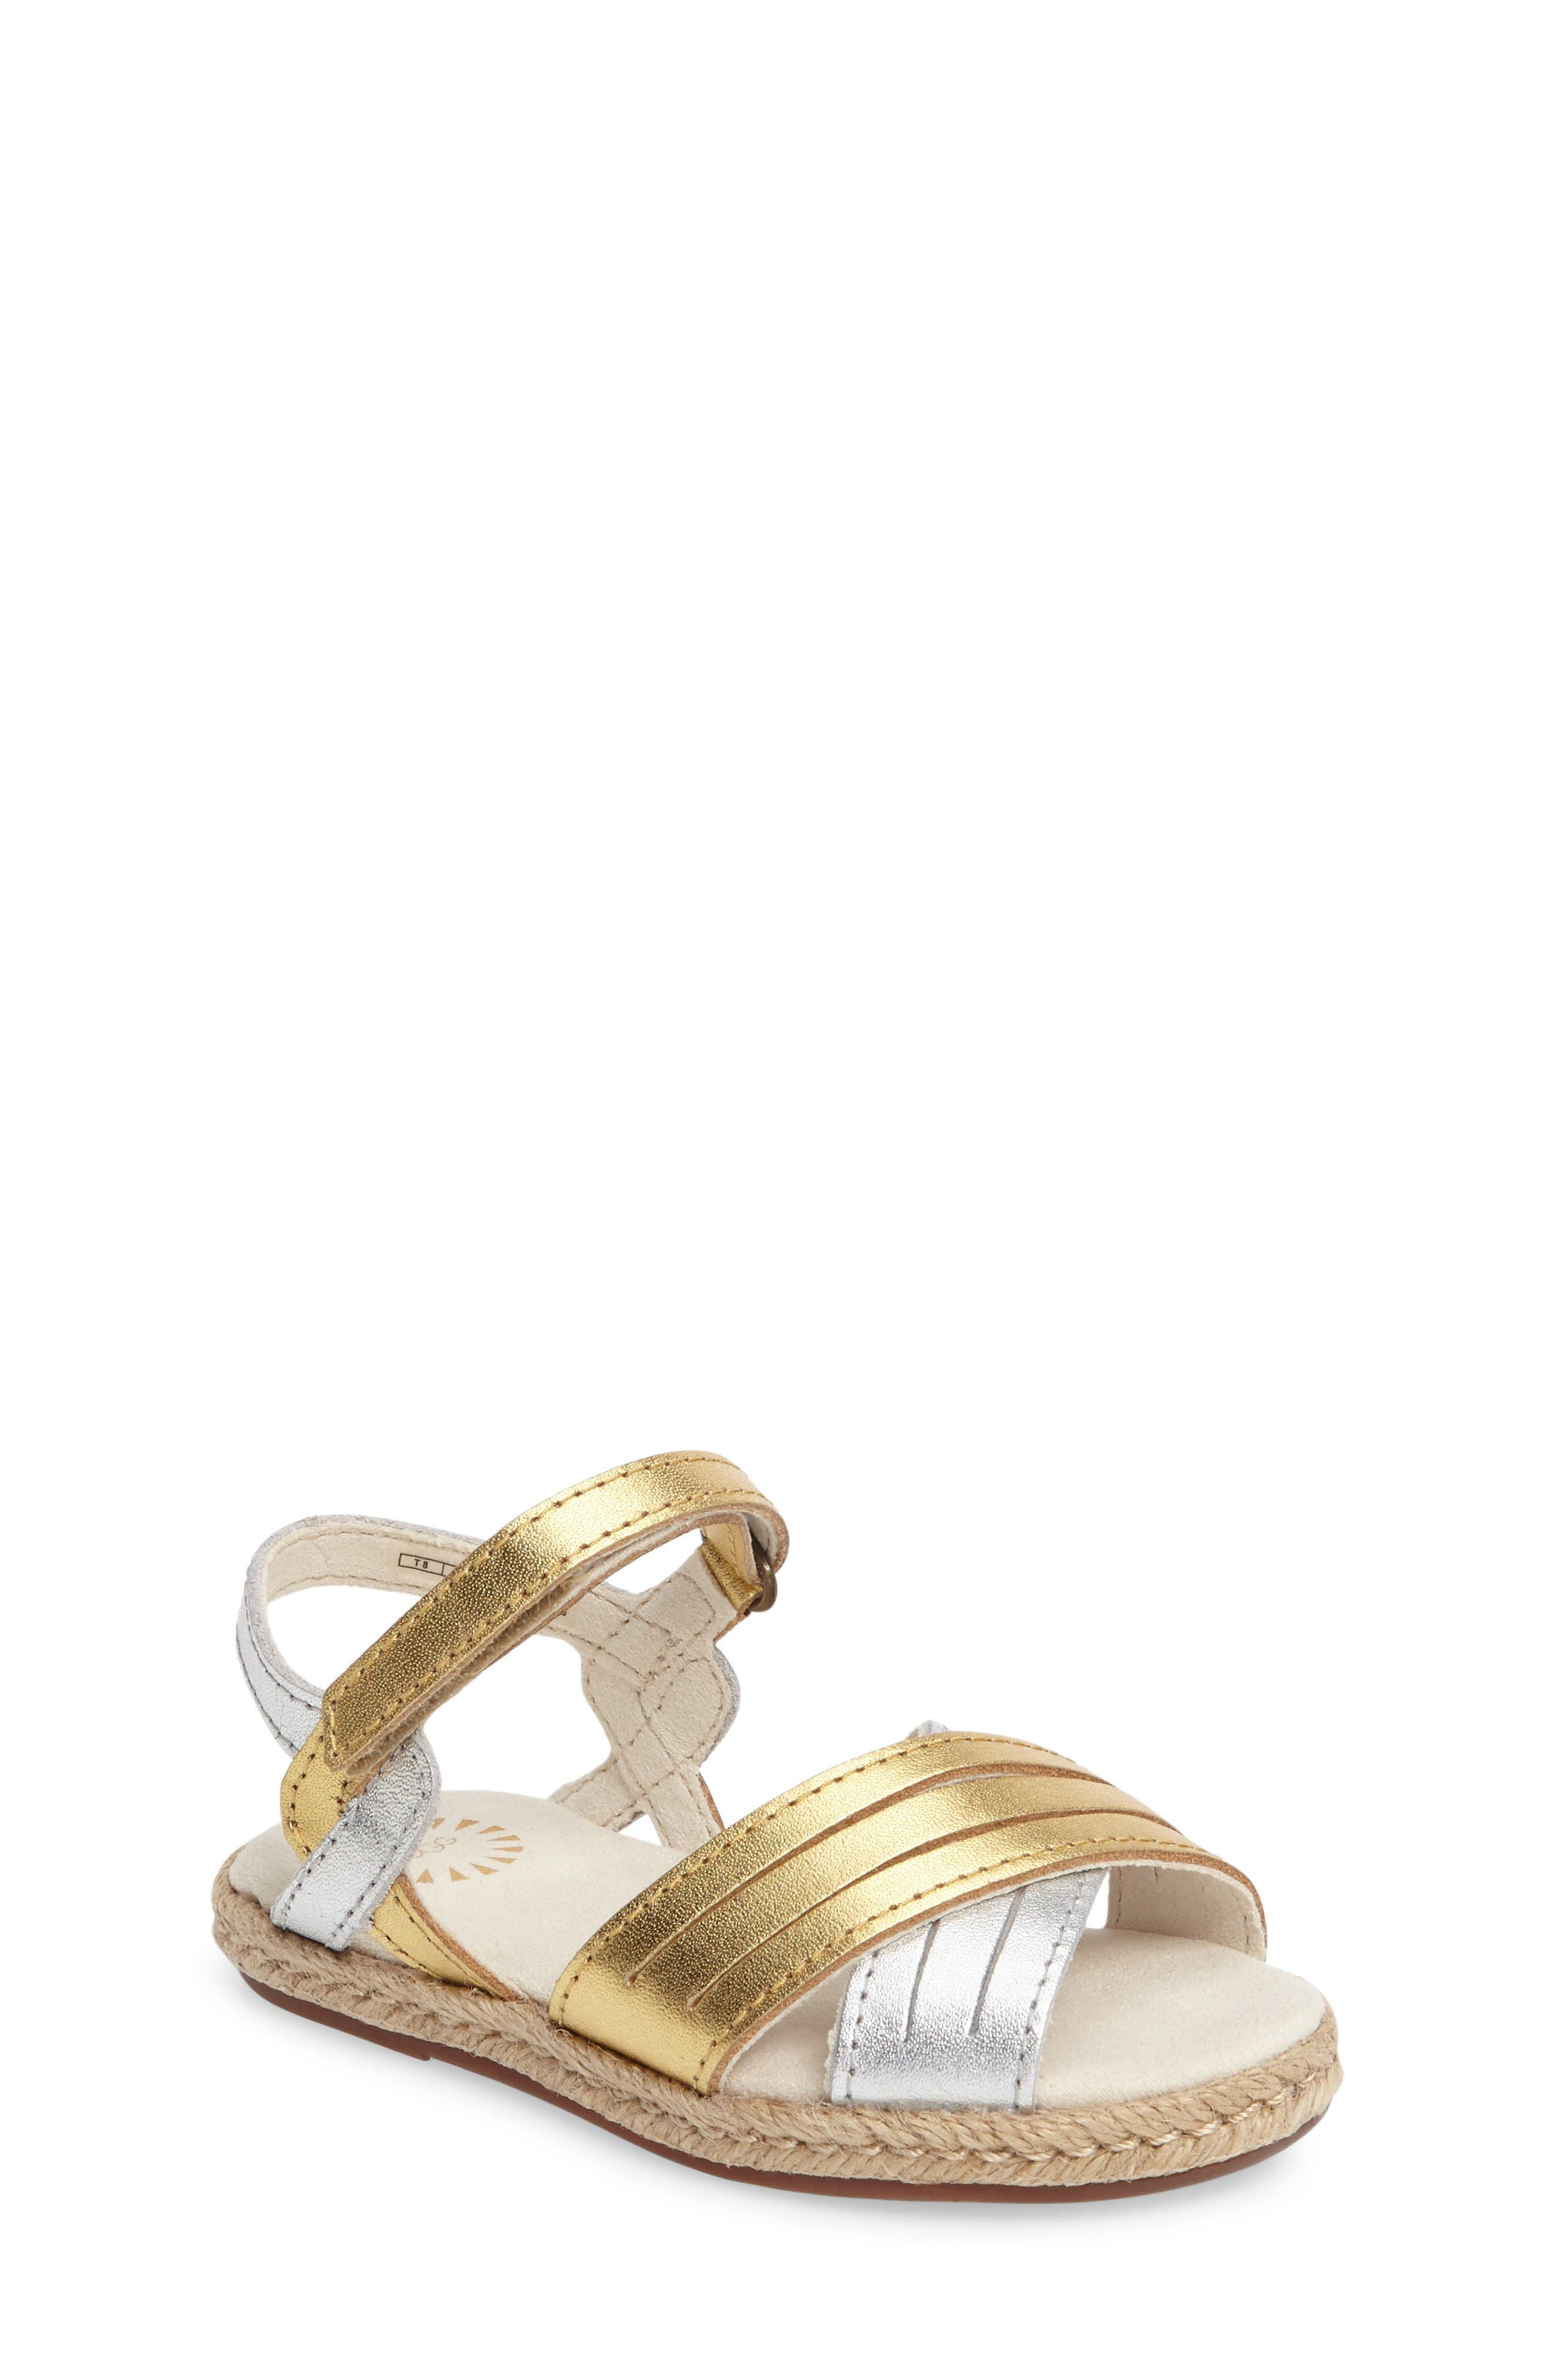 Addilyn Sandal,                         Main,                         color, Metallic